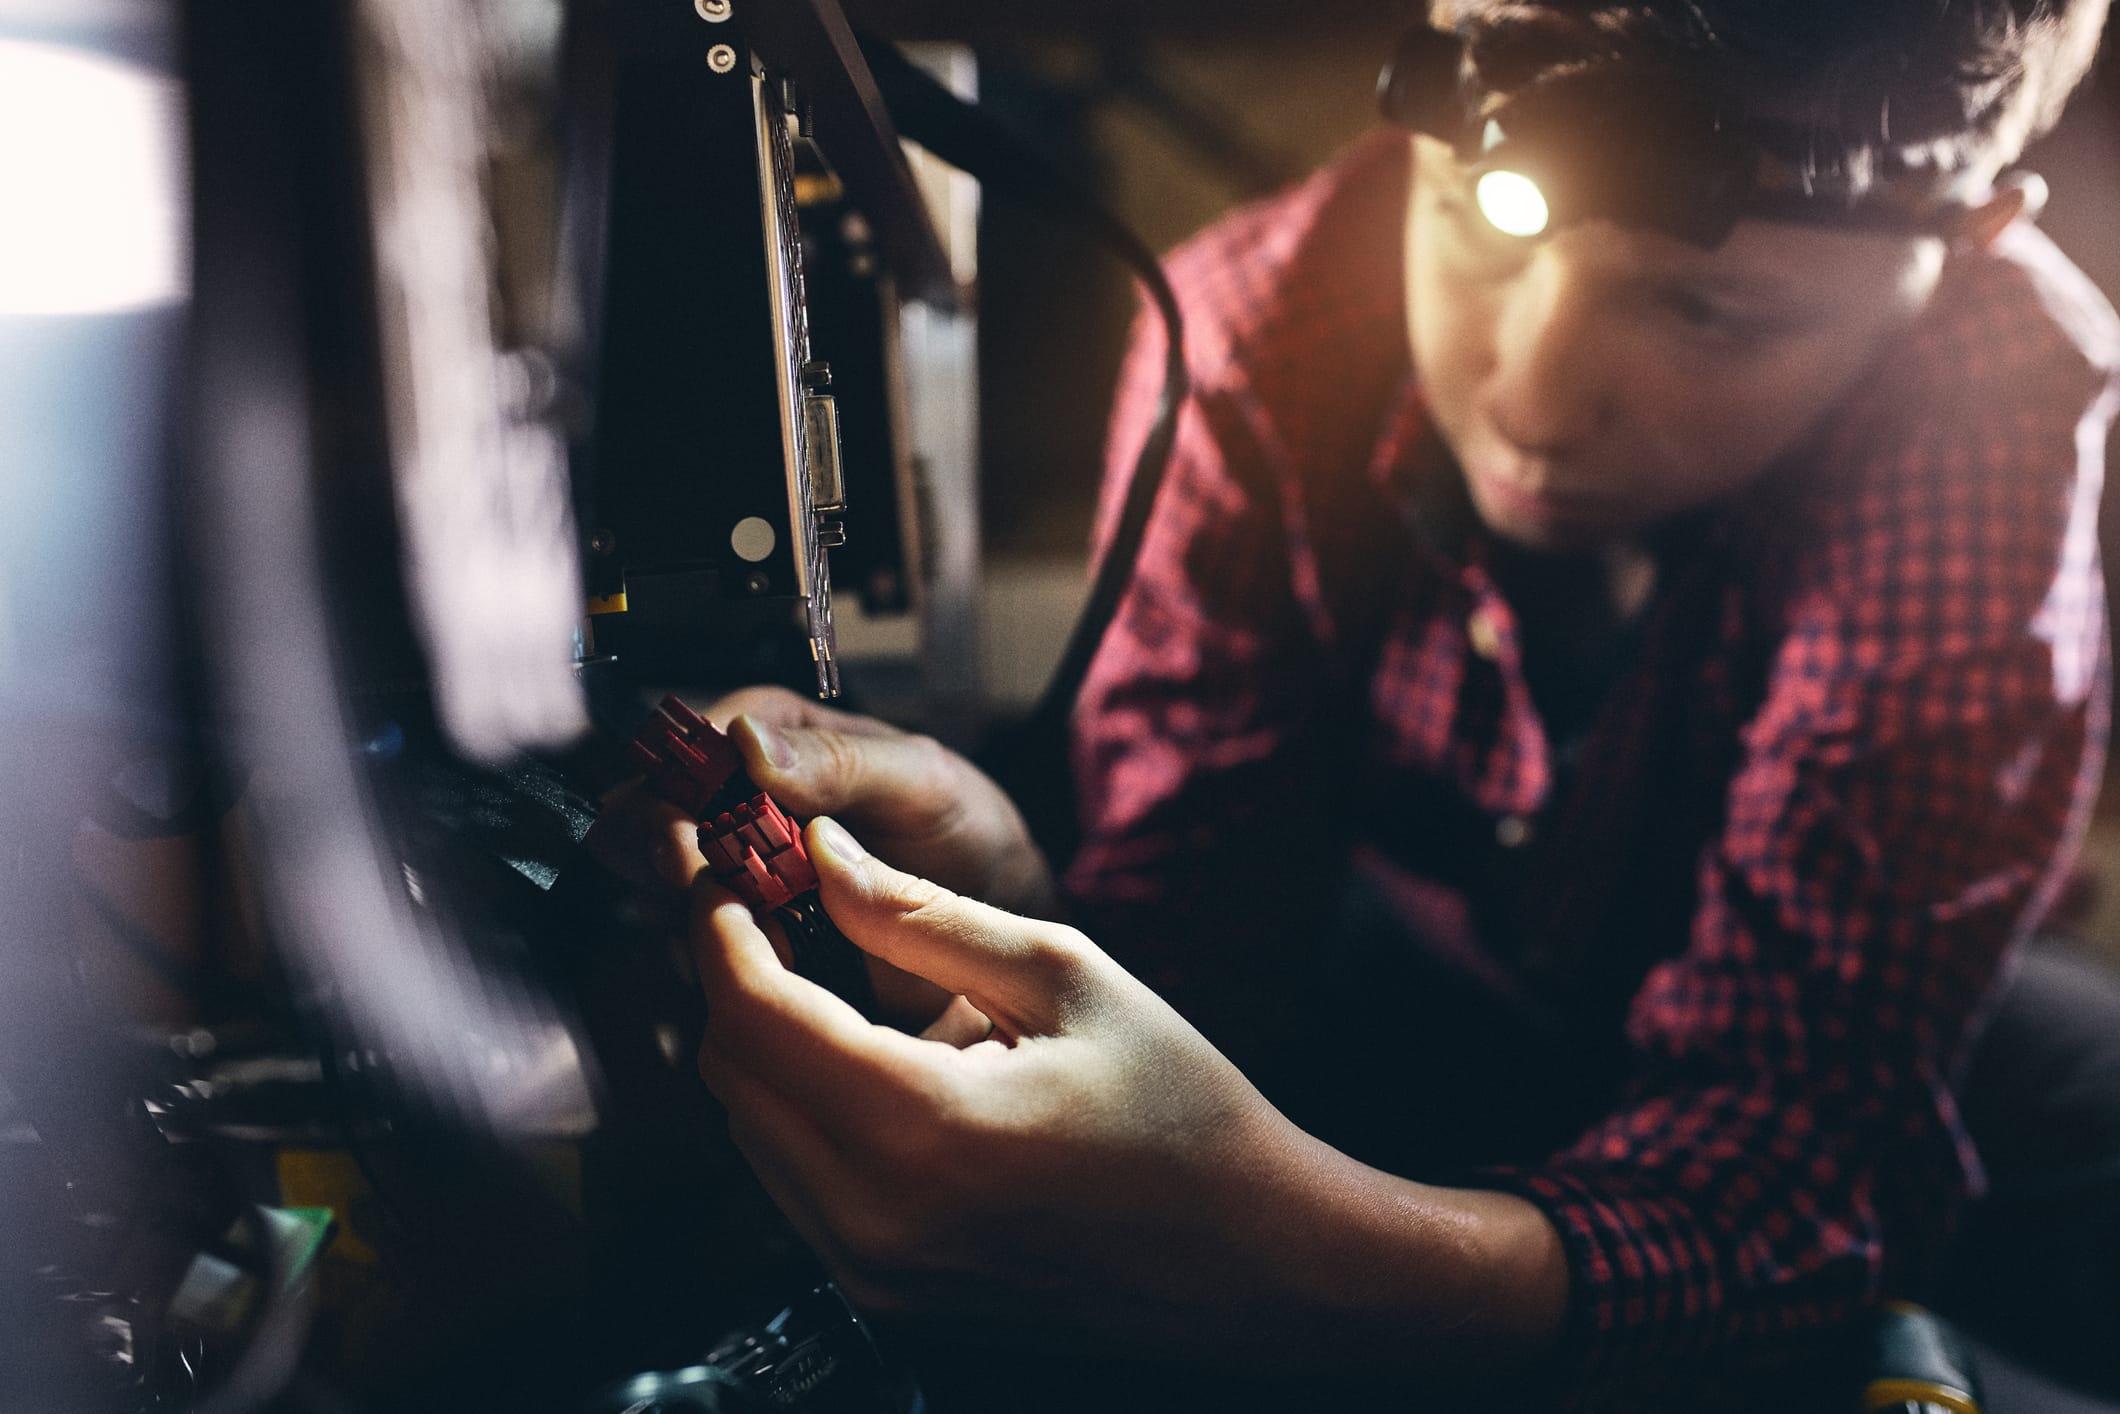 Teenager working on GPU mining rig